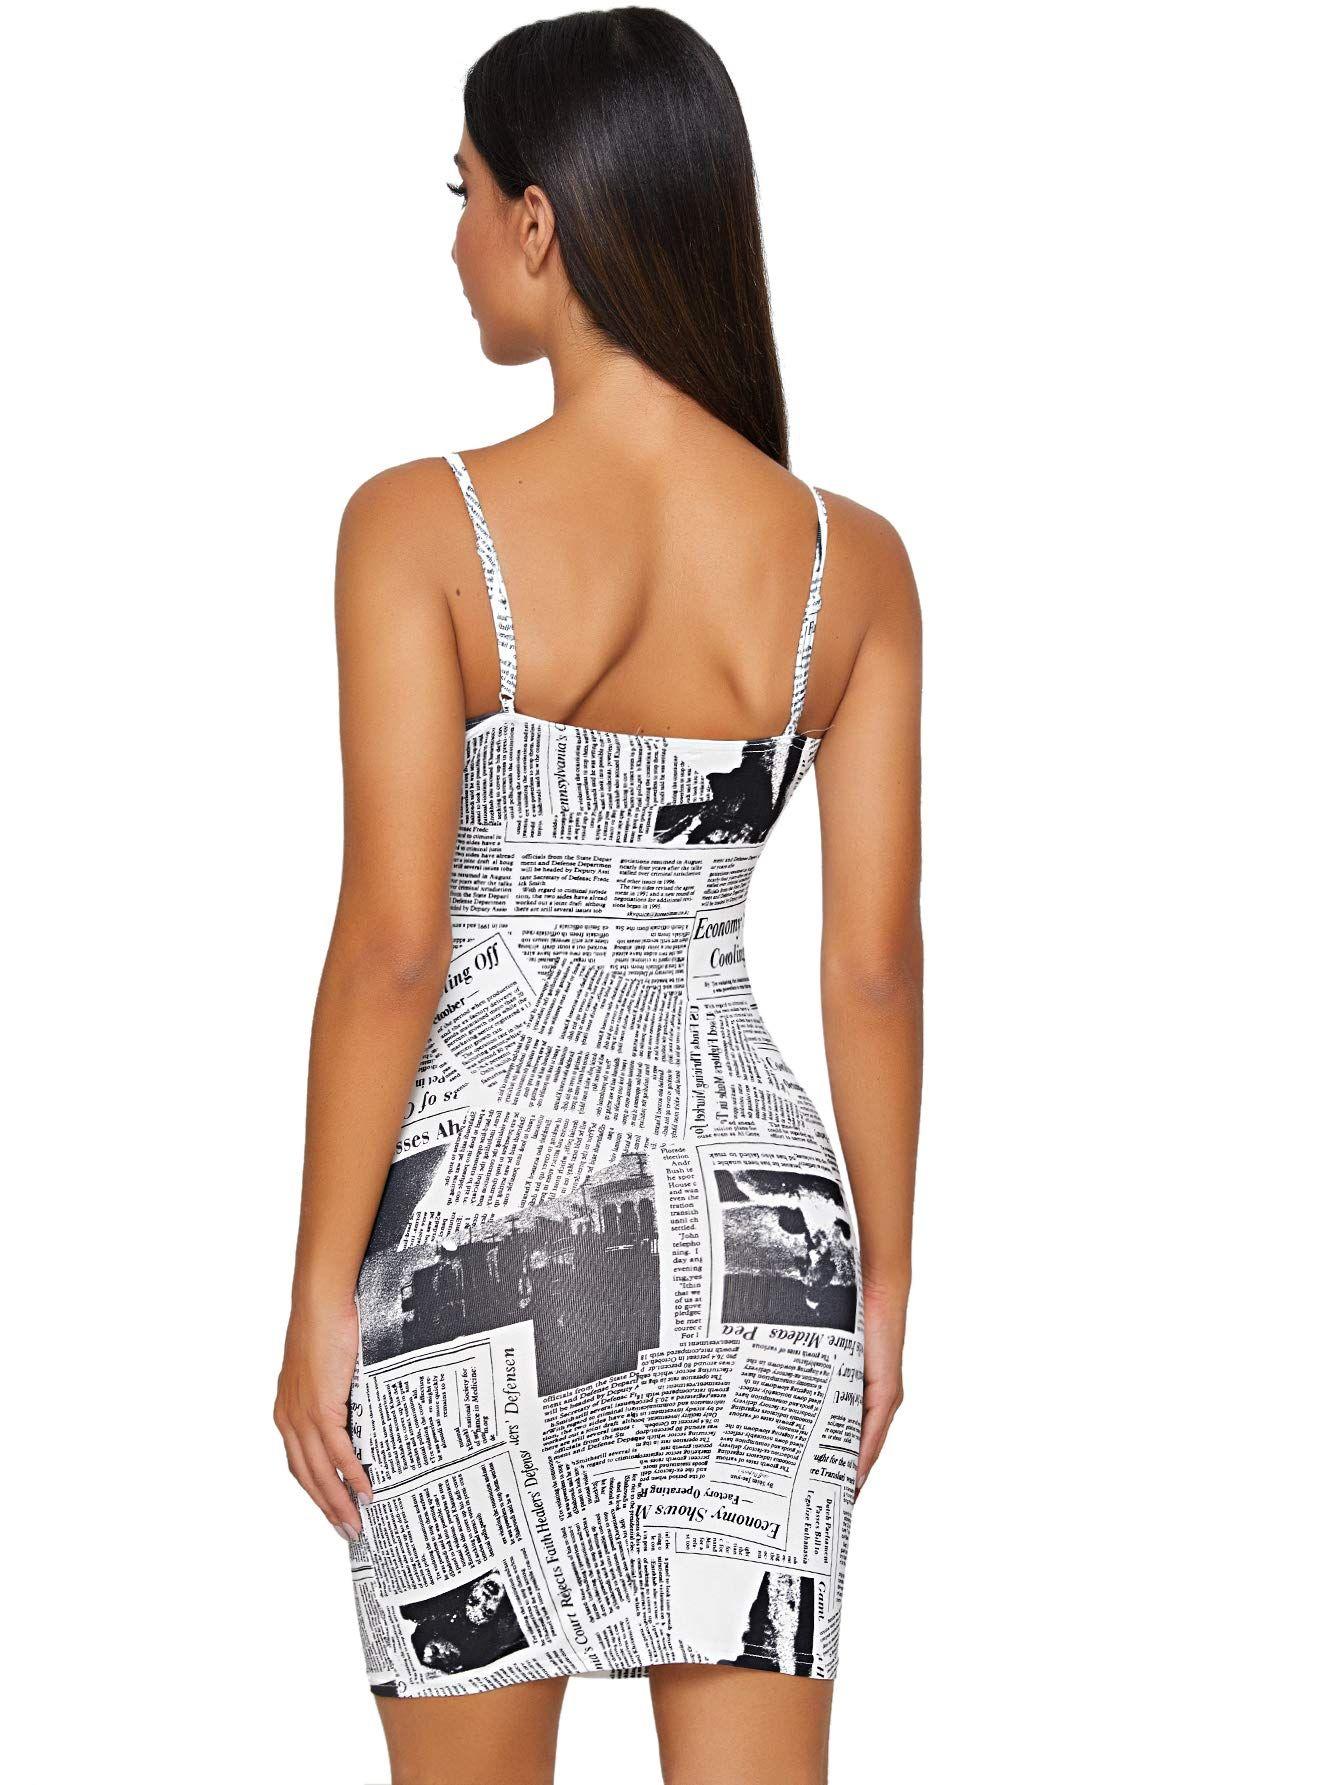 Soly Hux Spaghetti Newspaper Stretchy Stretchy Bodycon Dress Black Bodycon Dress Bodycon Dress [ 1785 x 1340 Pixel ]